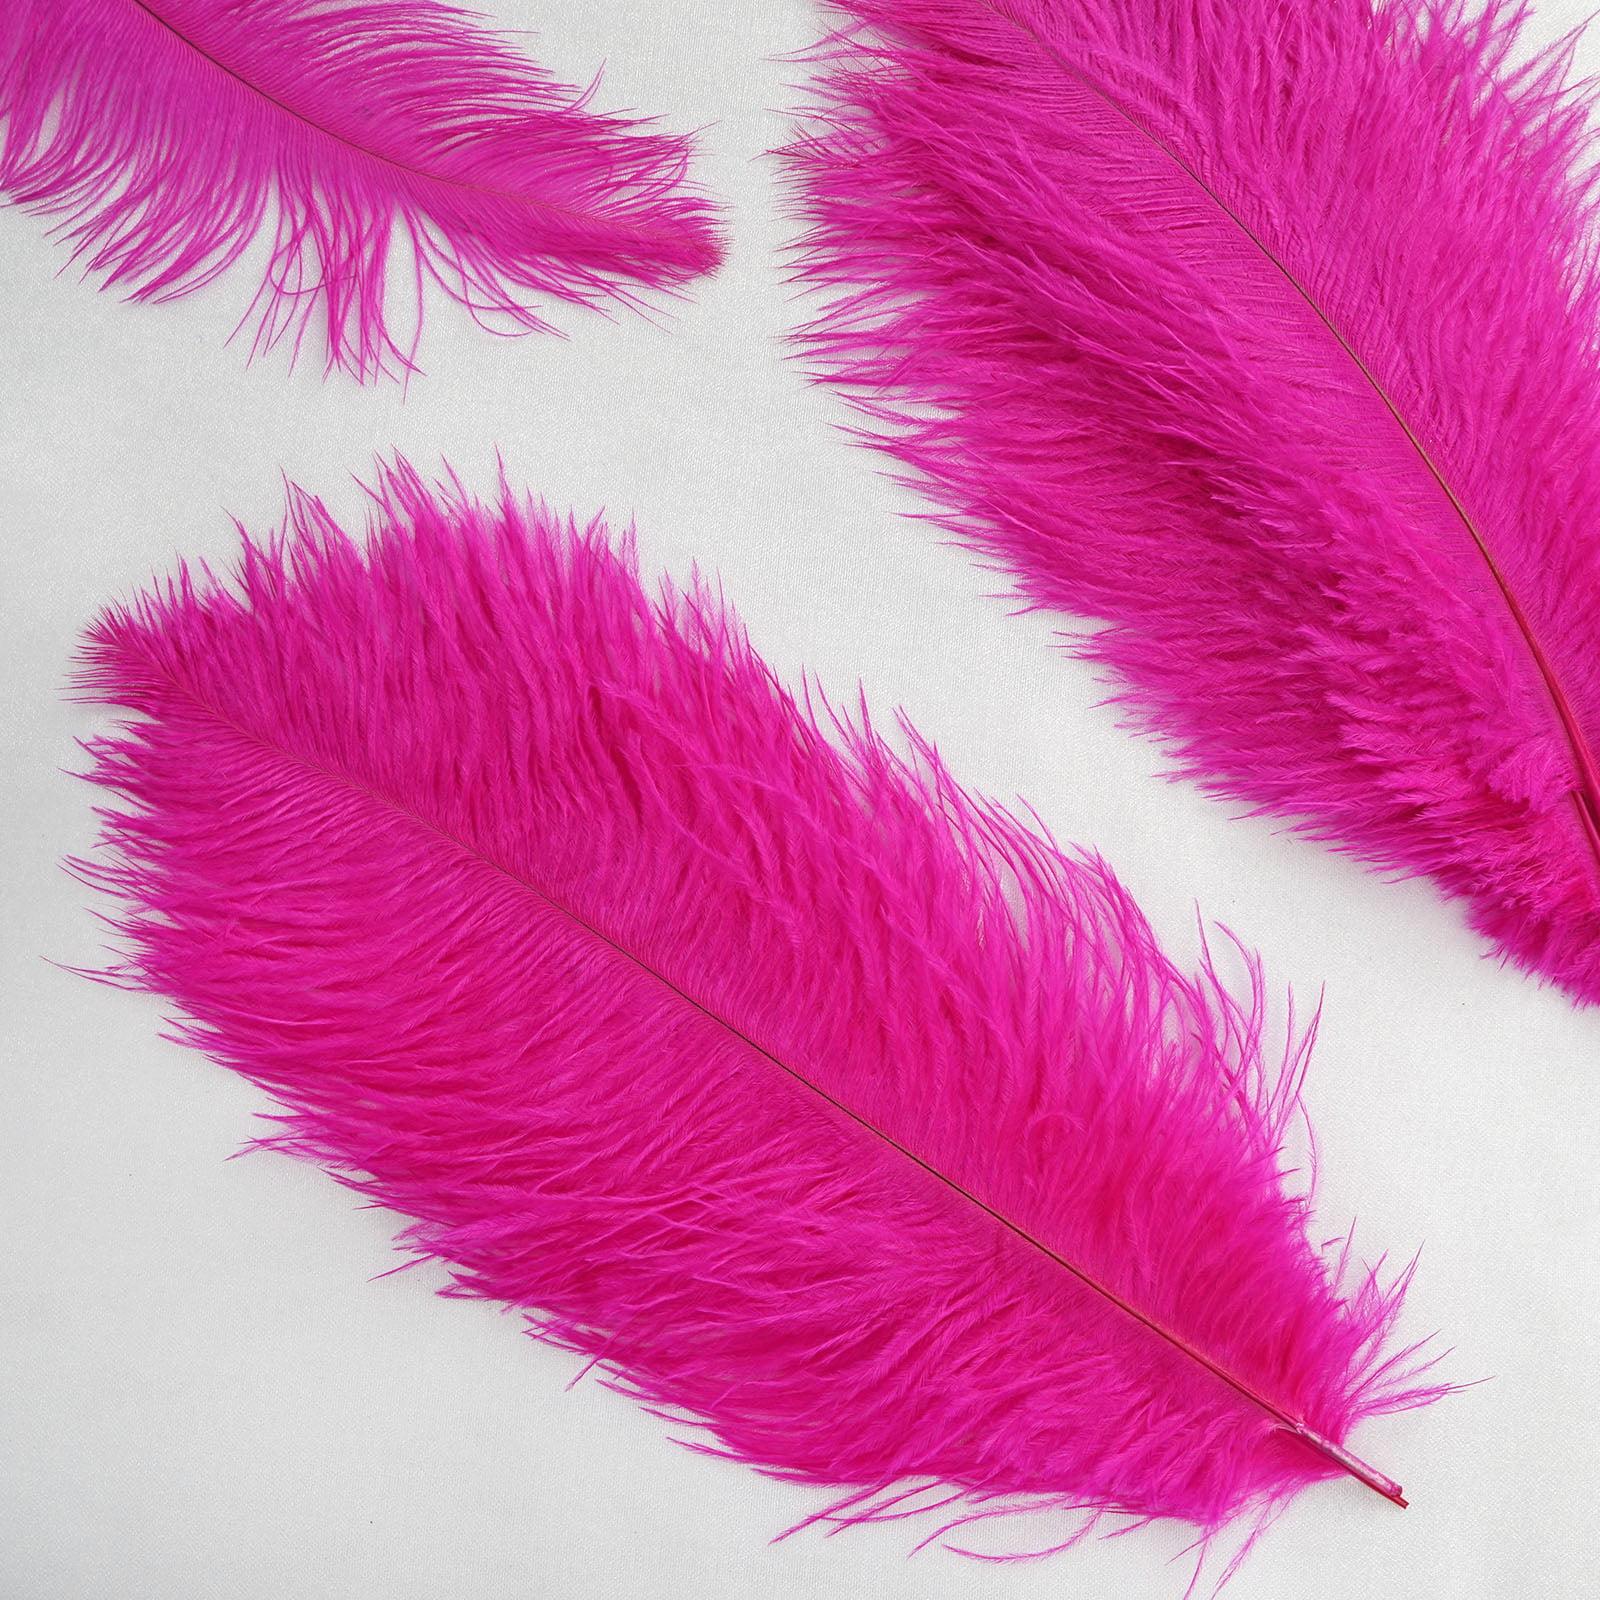 "BalsaCircle 12 pcs 13""-15"" long Authentic Ostrich Feathers - Centerpieces Wedding Party Table Decorations"